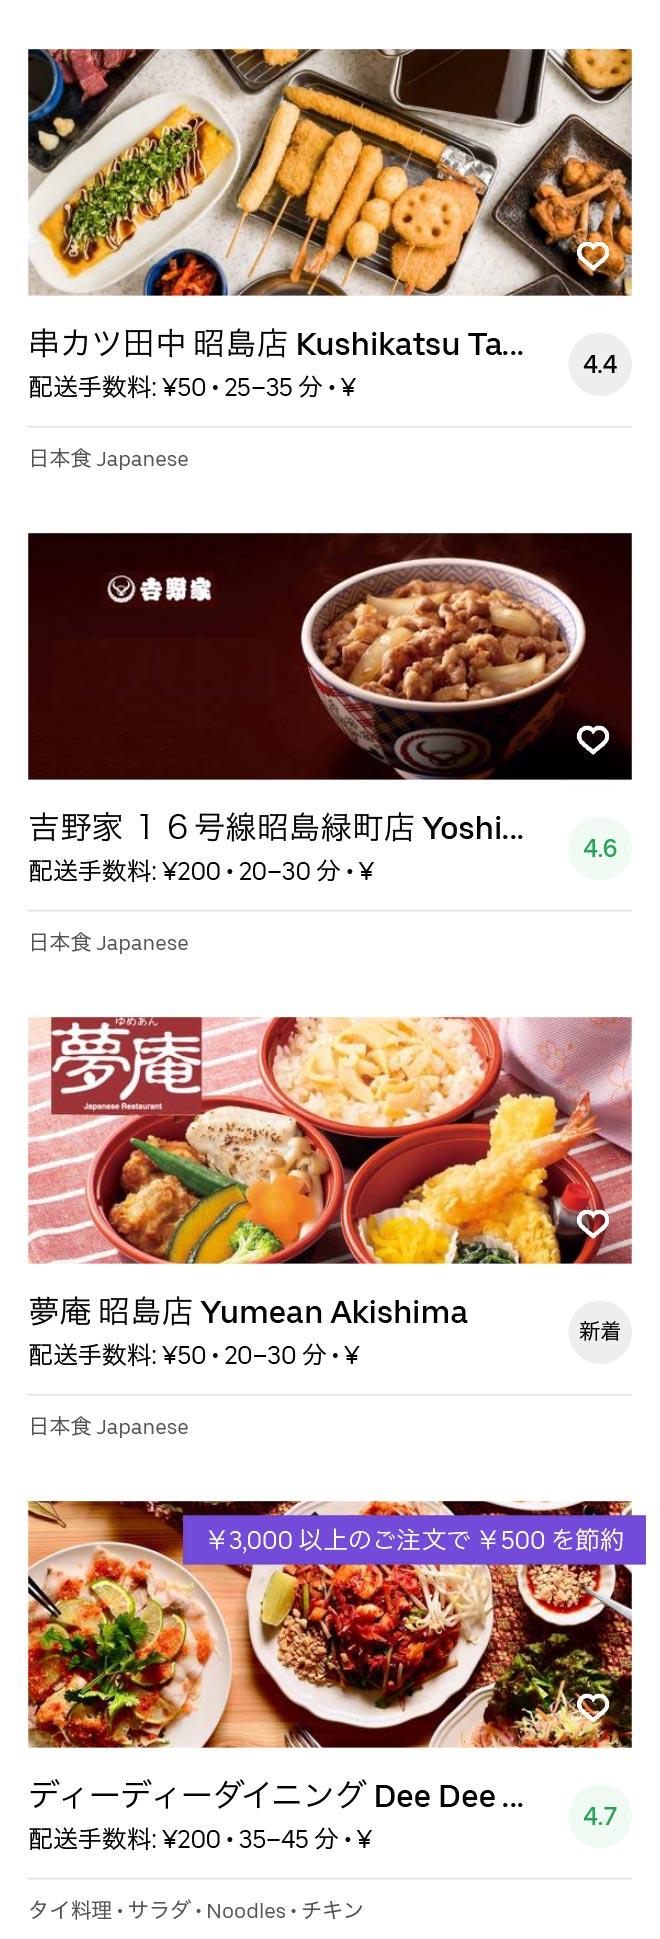 Akishima menu 2004 03